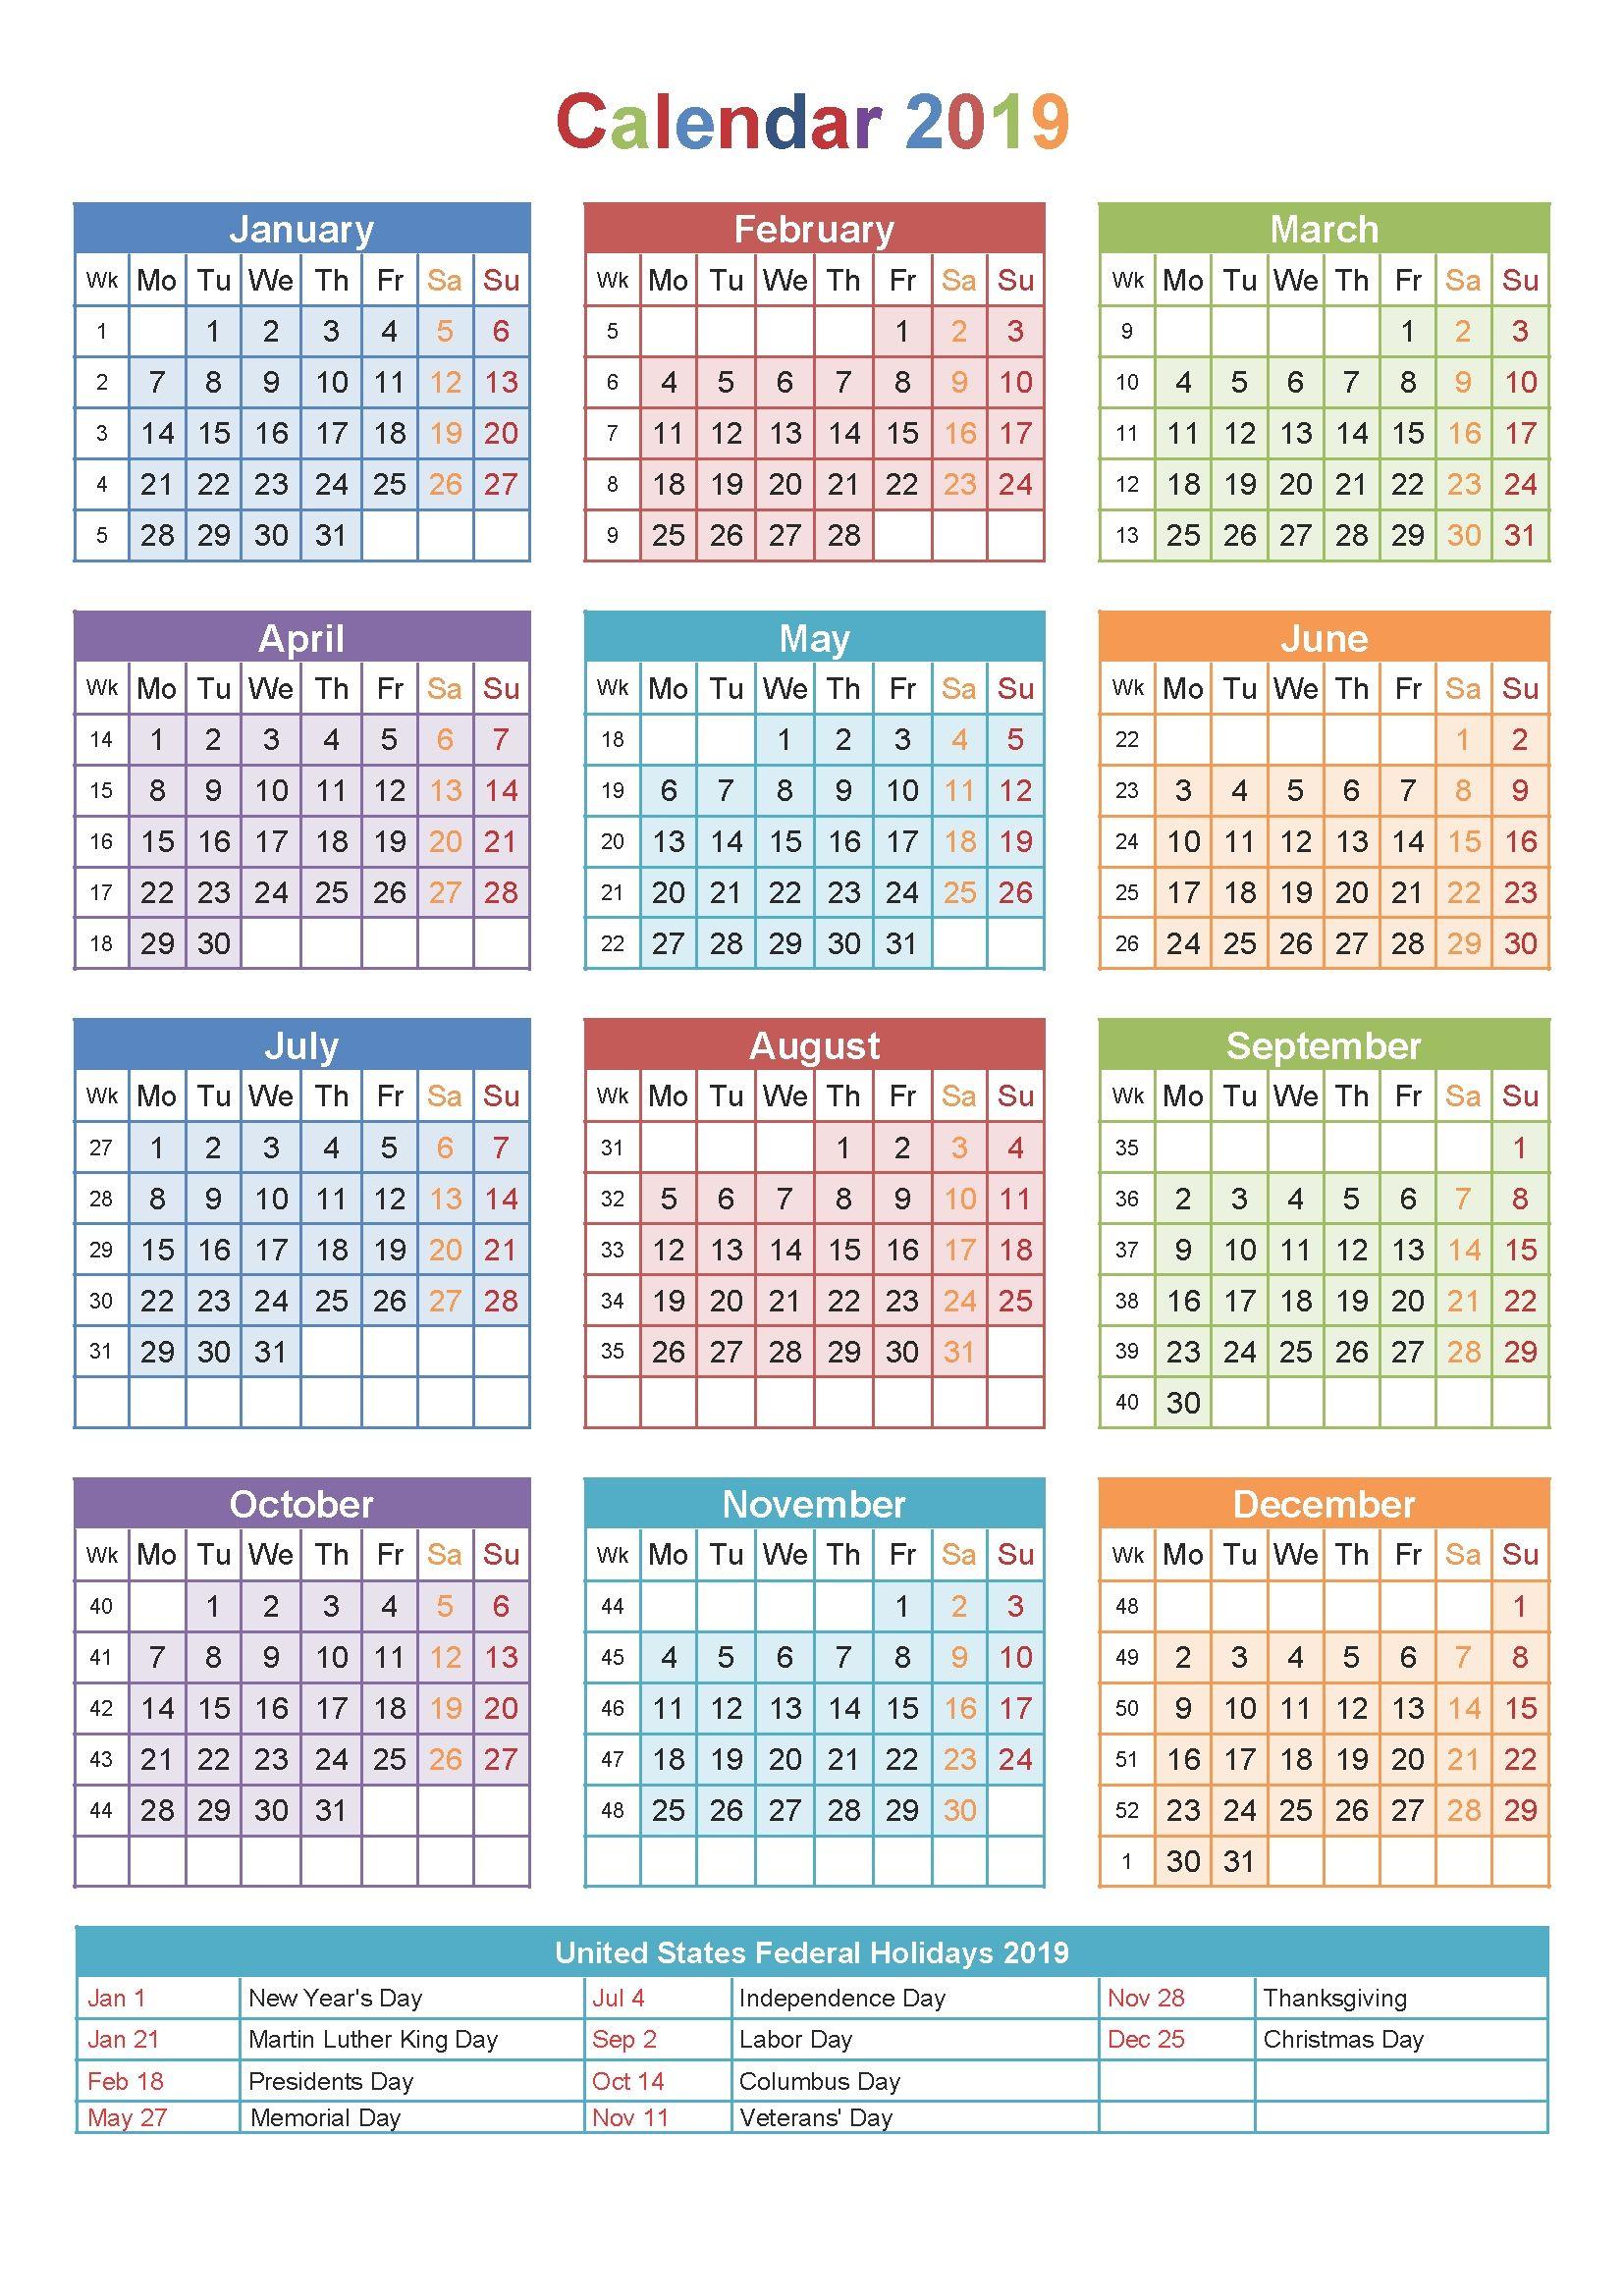 2019 Printable Calendar Templates Blank Word Pdf 2018 Calendar Catch Check More Calendar 2019 Template Printable Calendar Template Blank Calendar Template